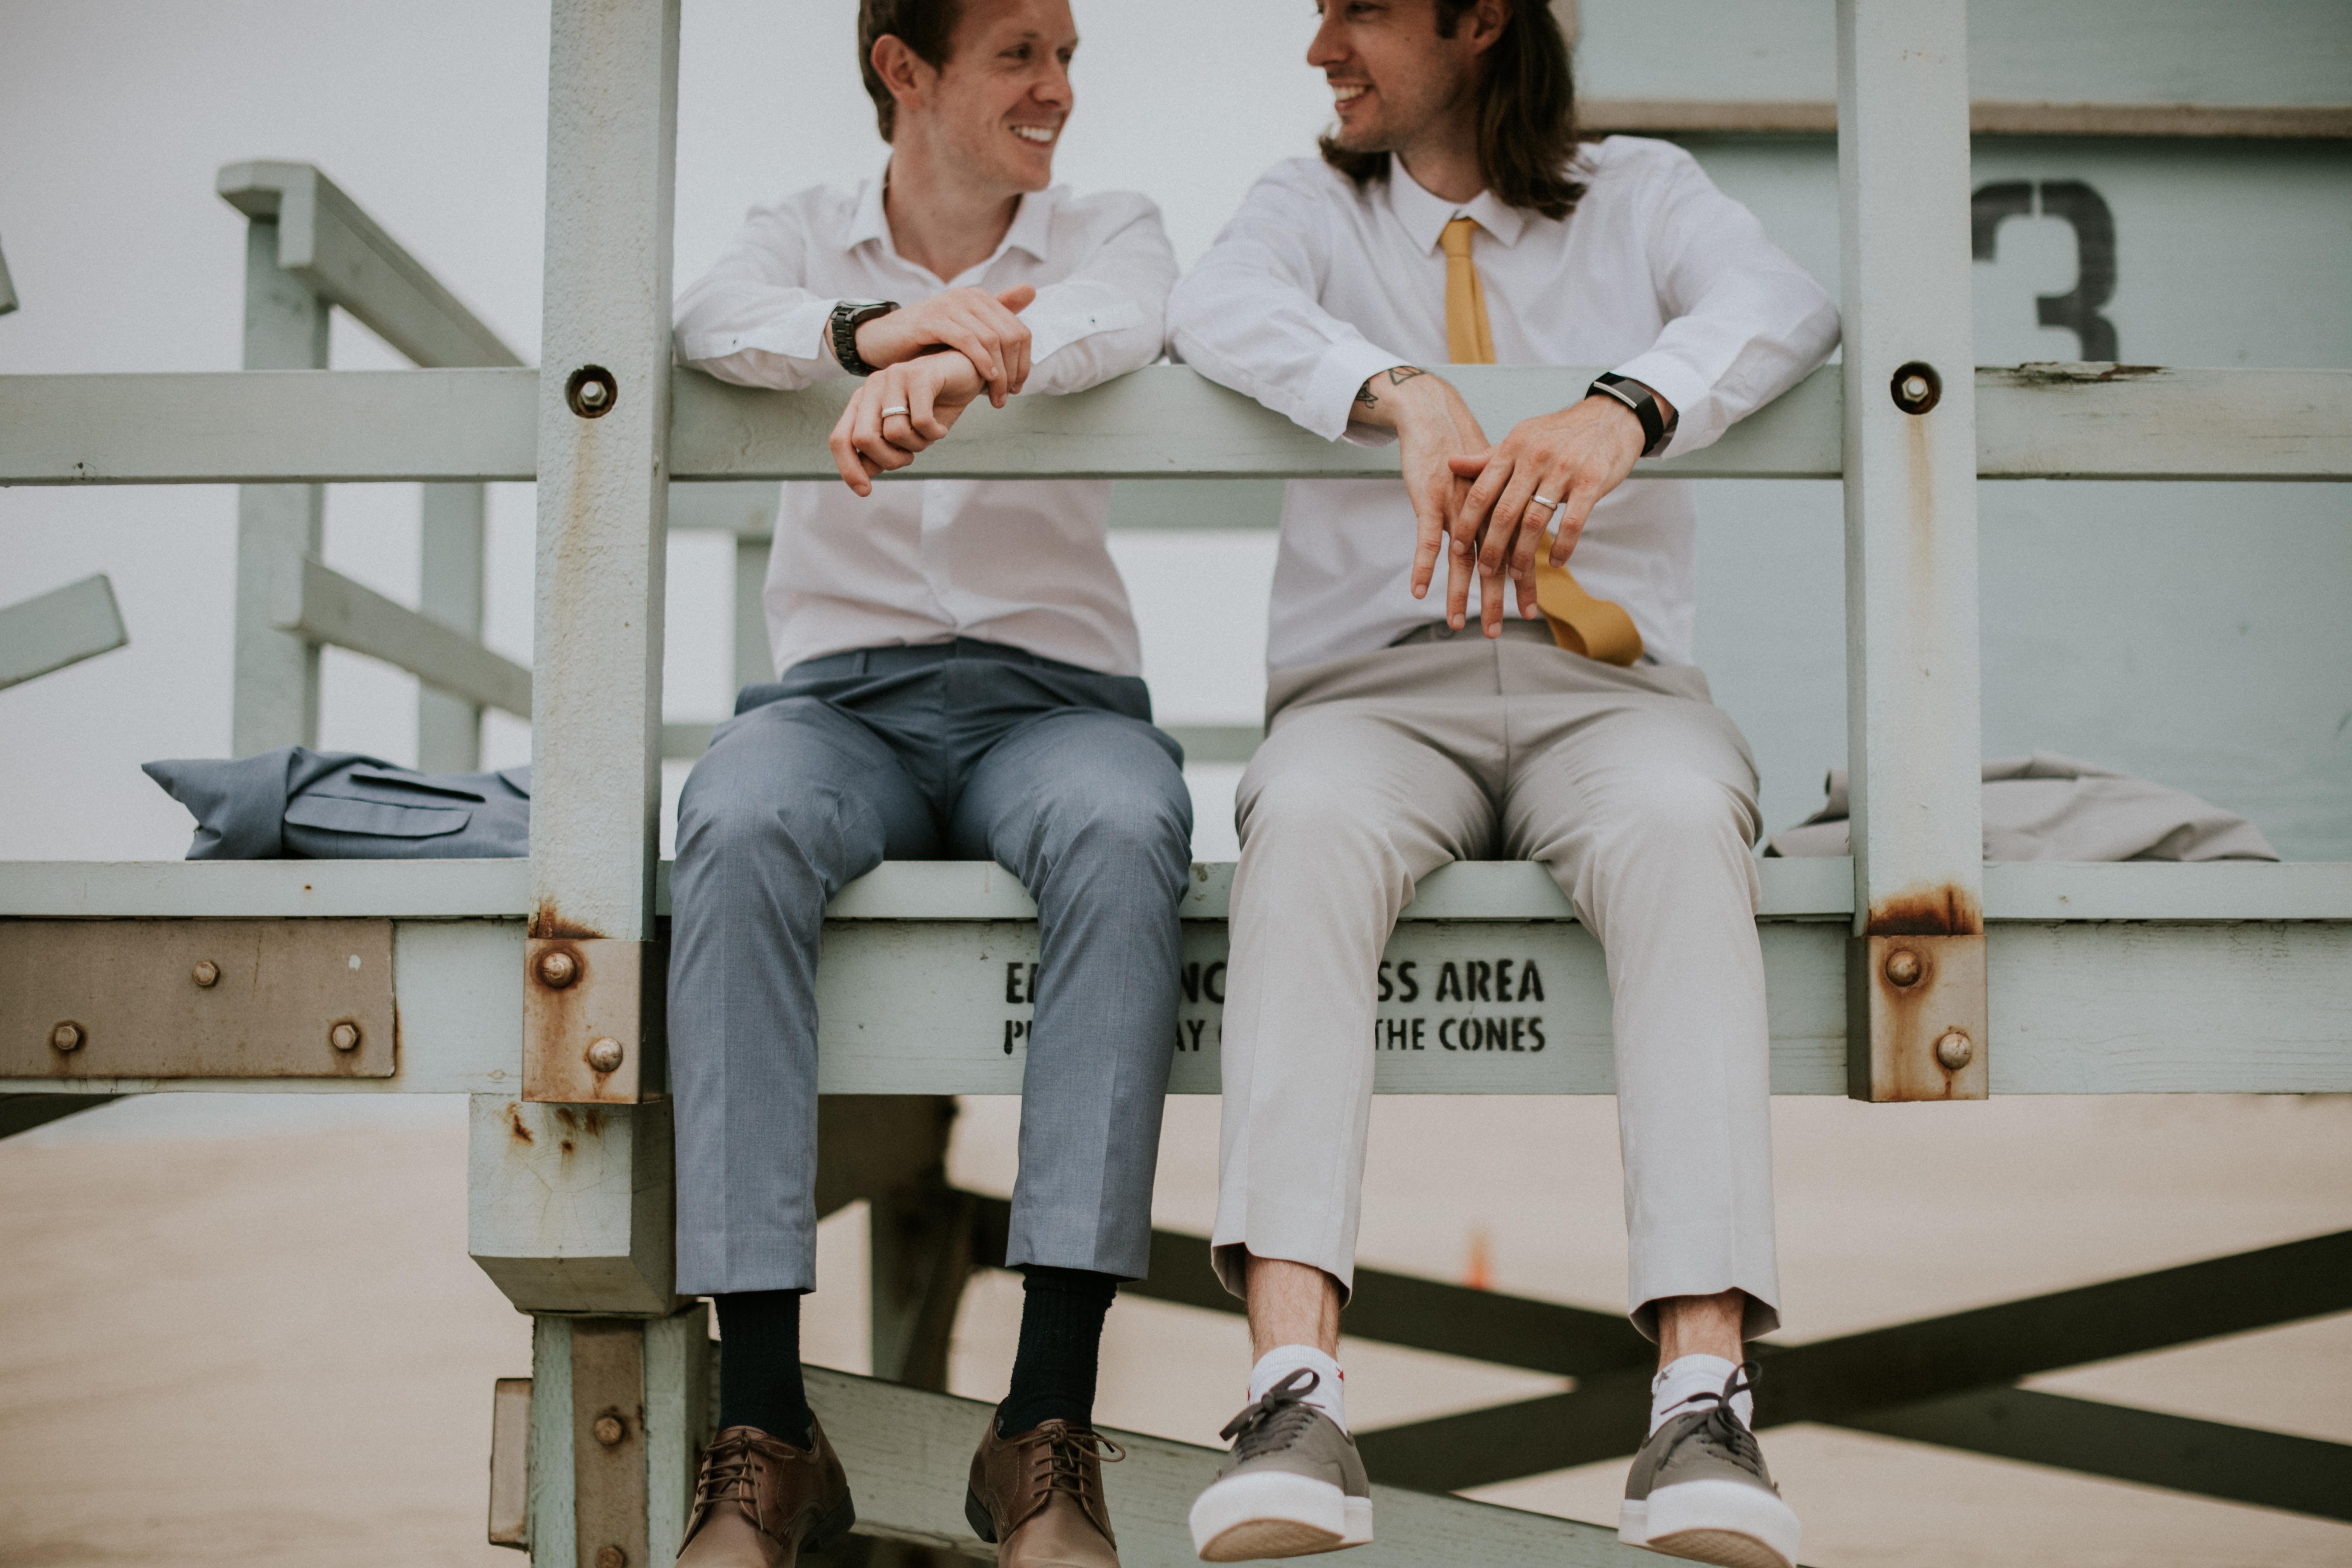 groom and groom posed on beach lifeguard tower gay wedding photography point dume beach malibu calif